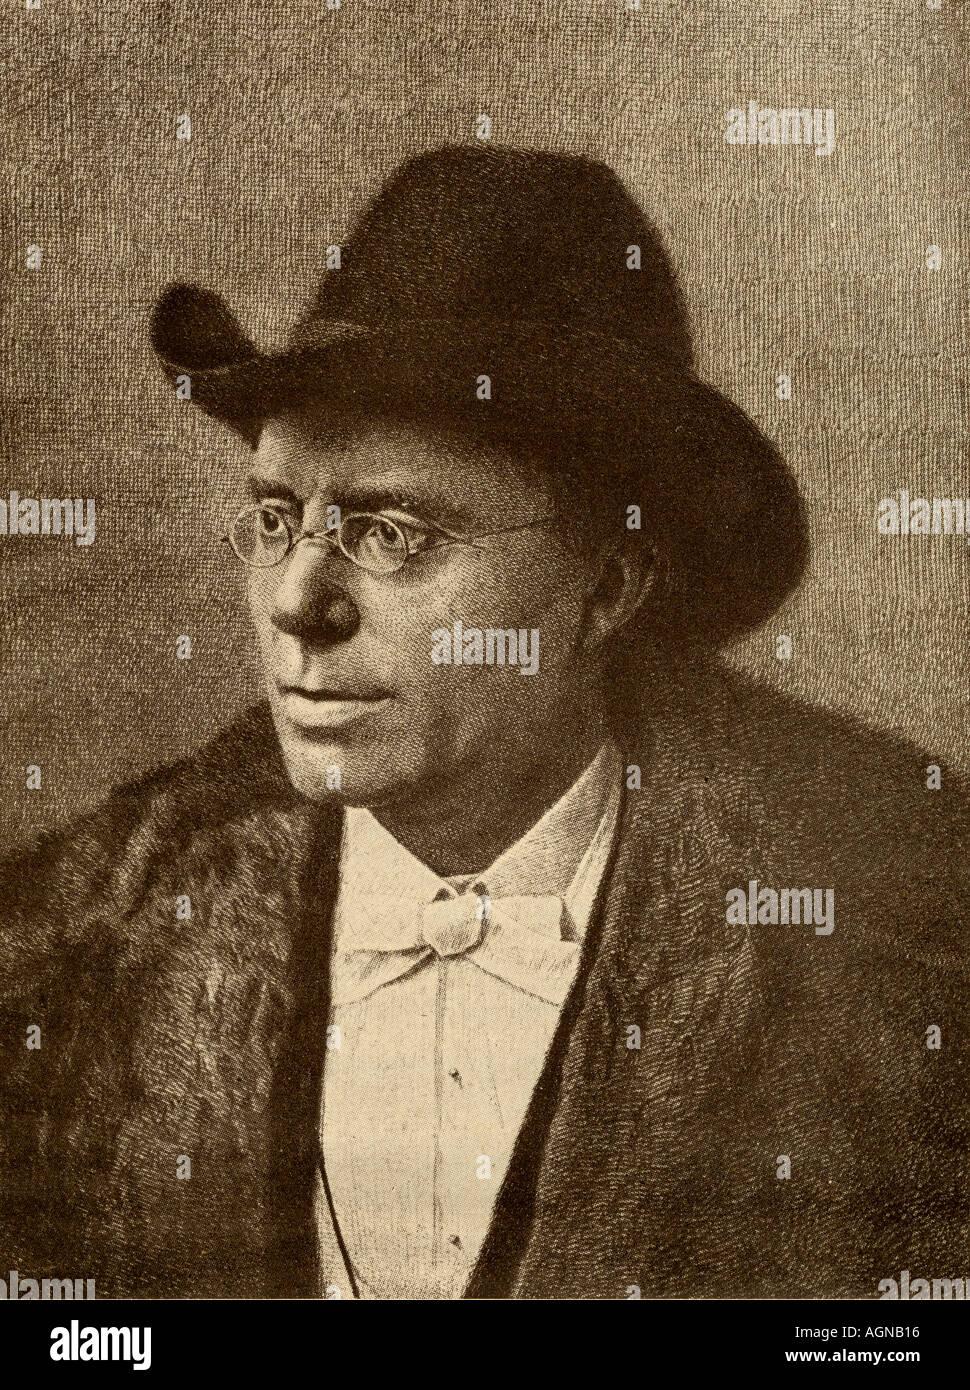 Jonas Lauritz Idemil Lie, 1833 - 1908. Norwegian novelist, poet, and playwright. - Stock Image